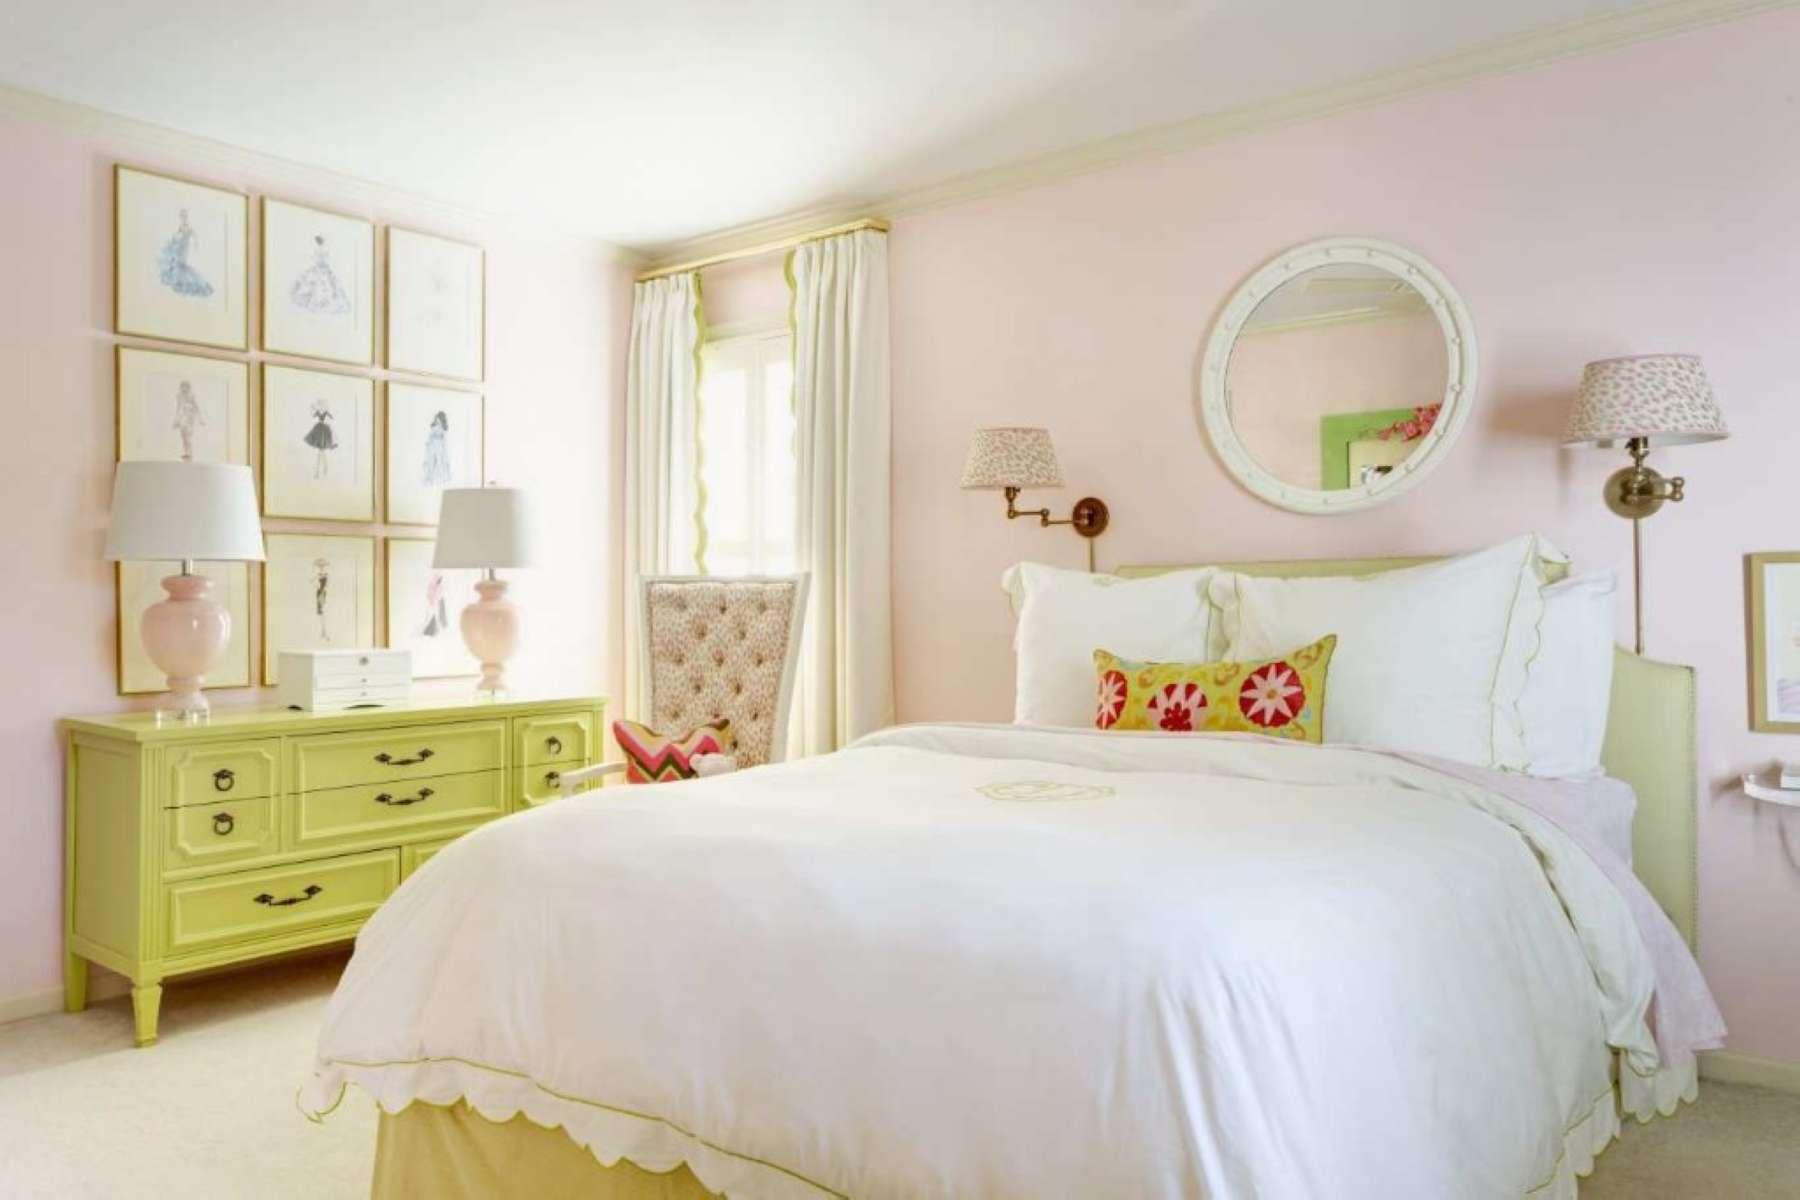 Krista-Lewis-Interior-Design-Southern-Classic_005Optmized